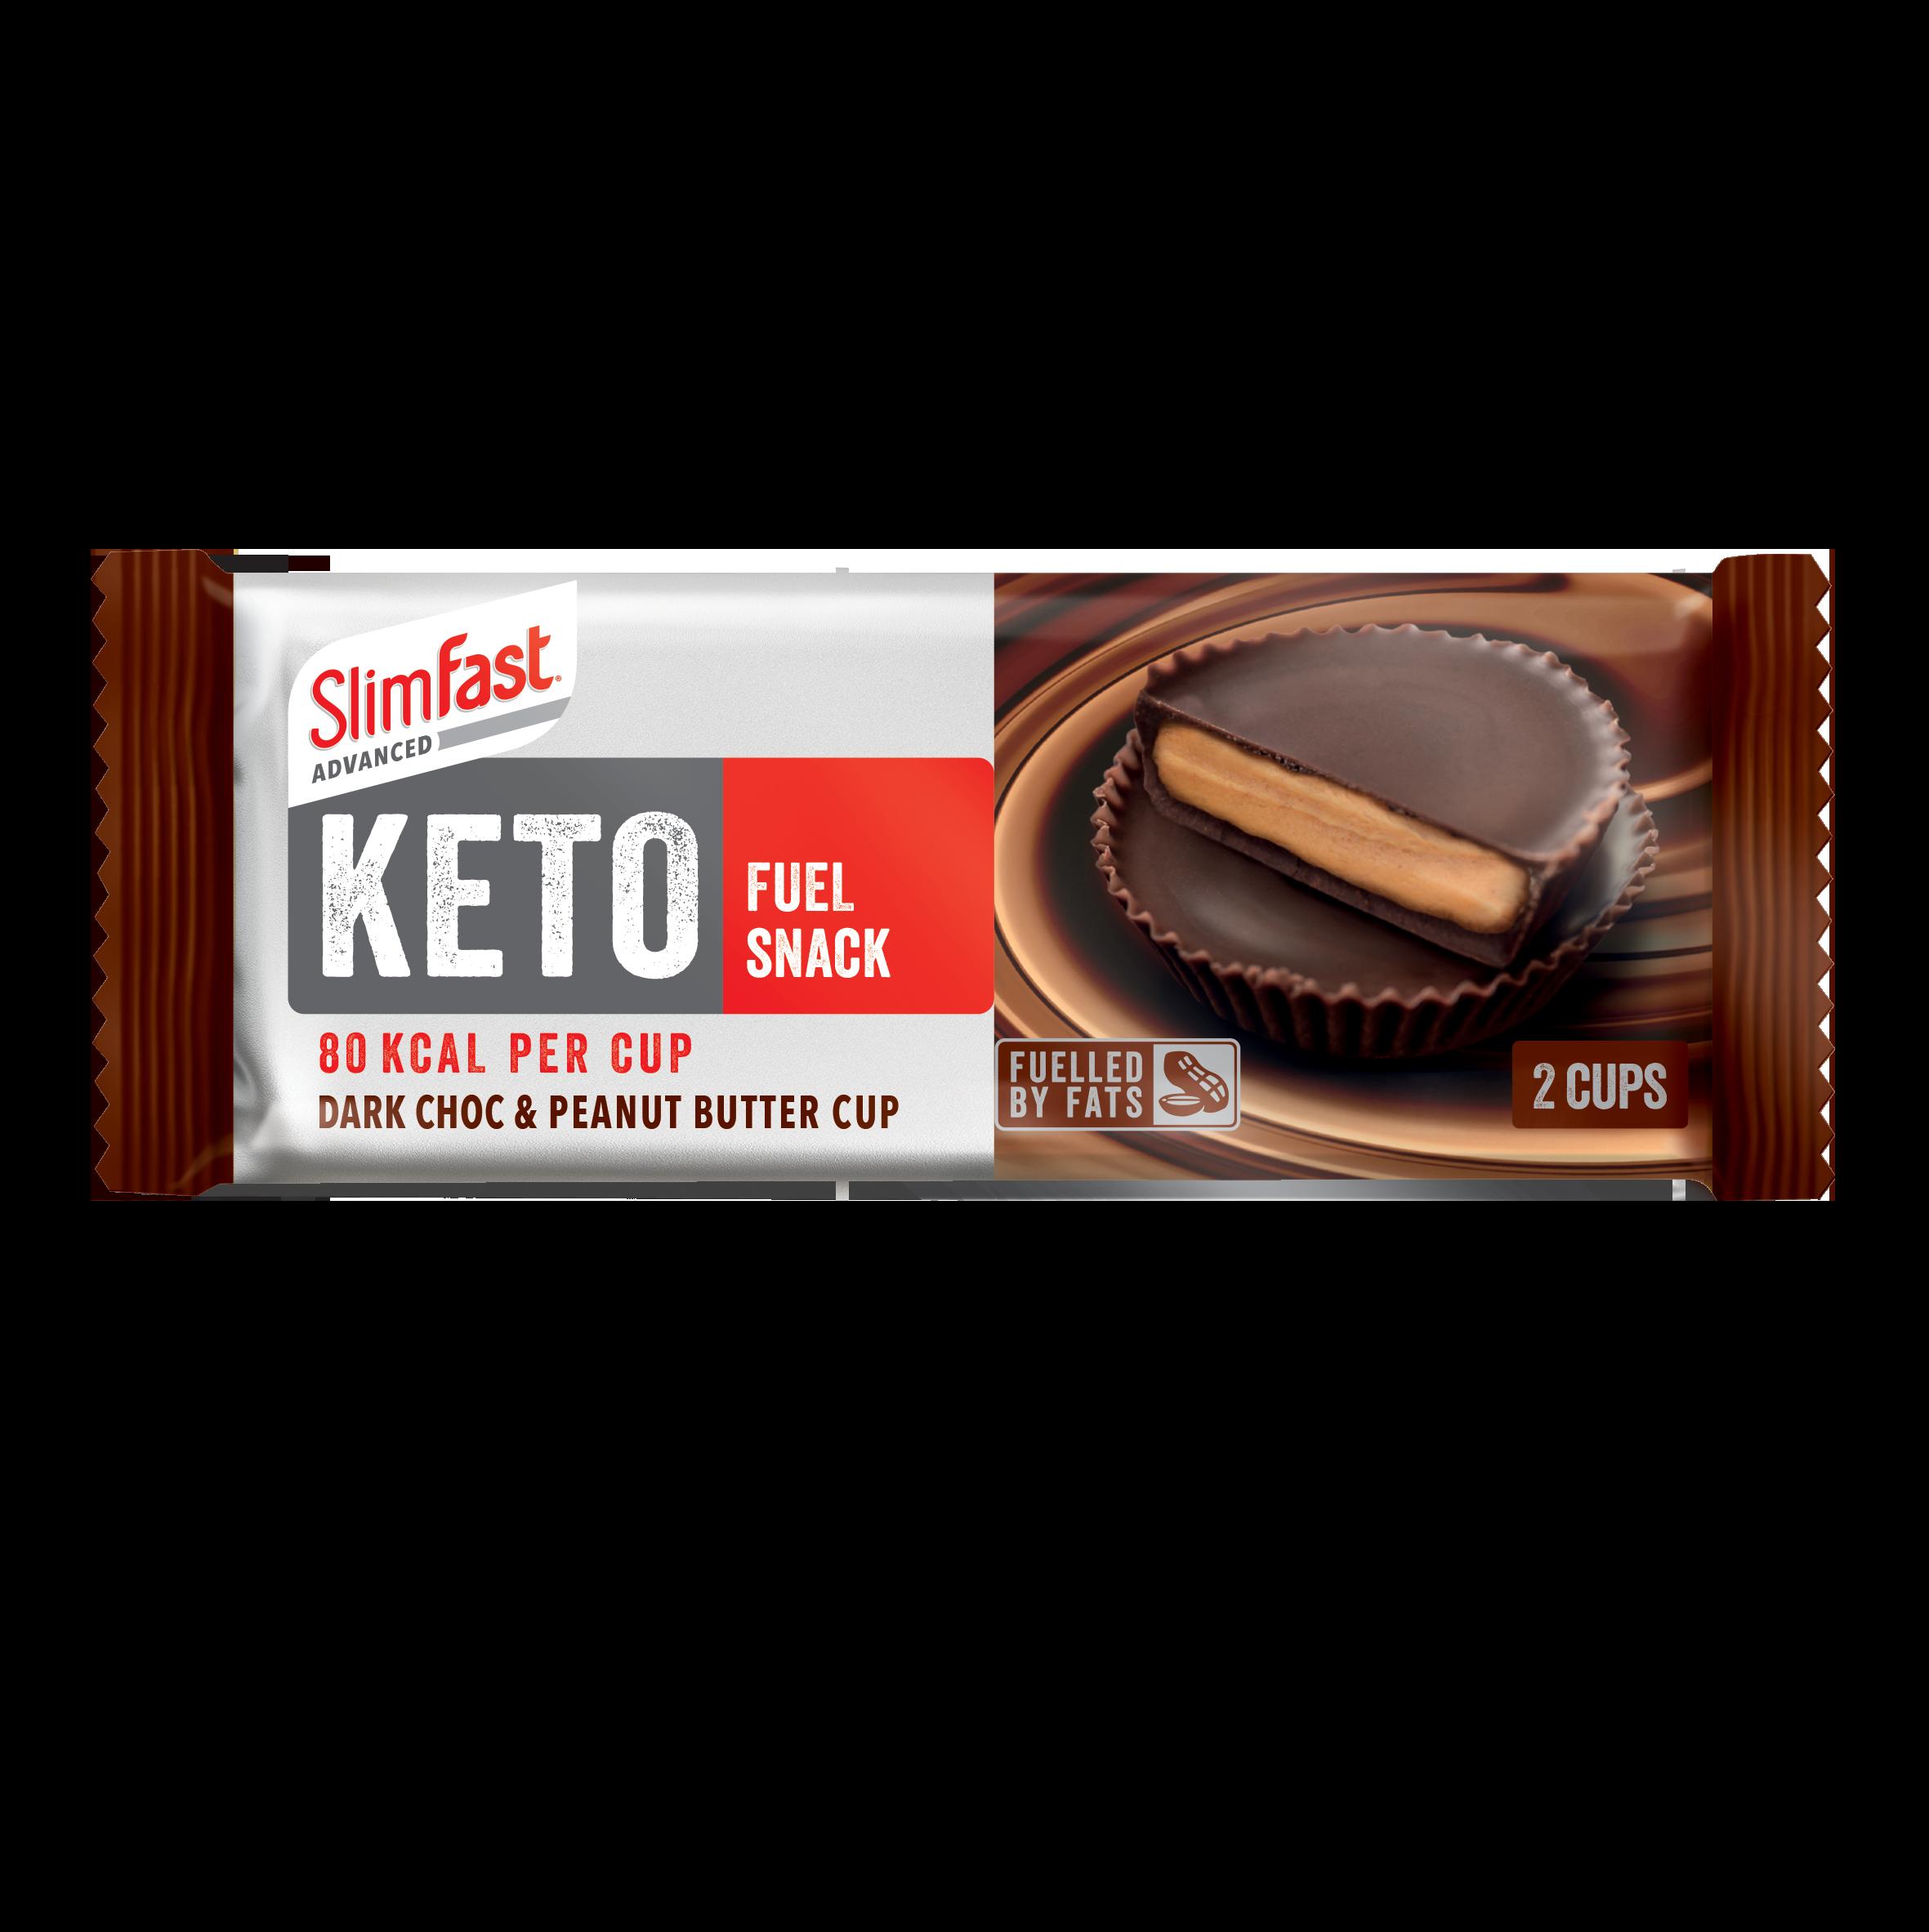 Dark Choc Peanut Butter Keto Fuel Snack